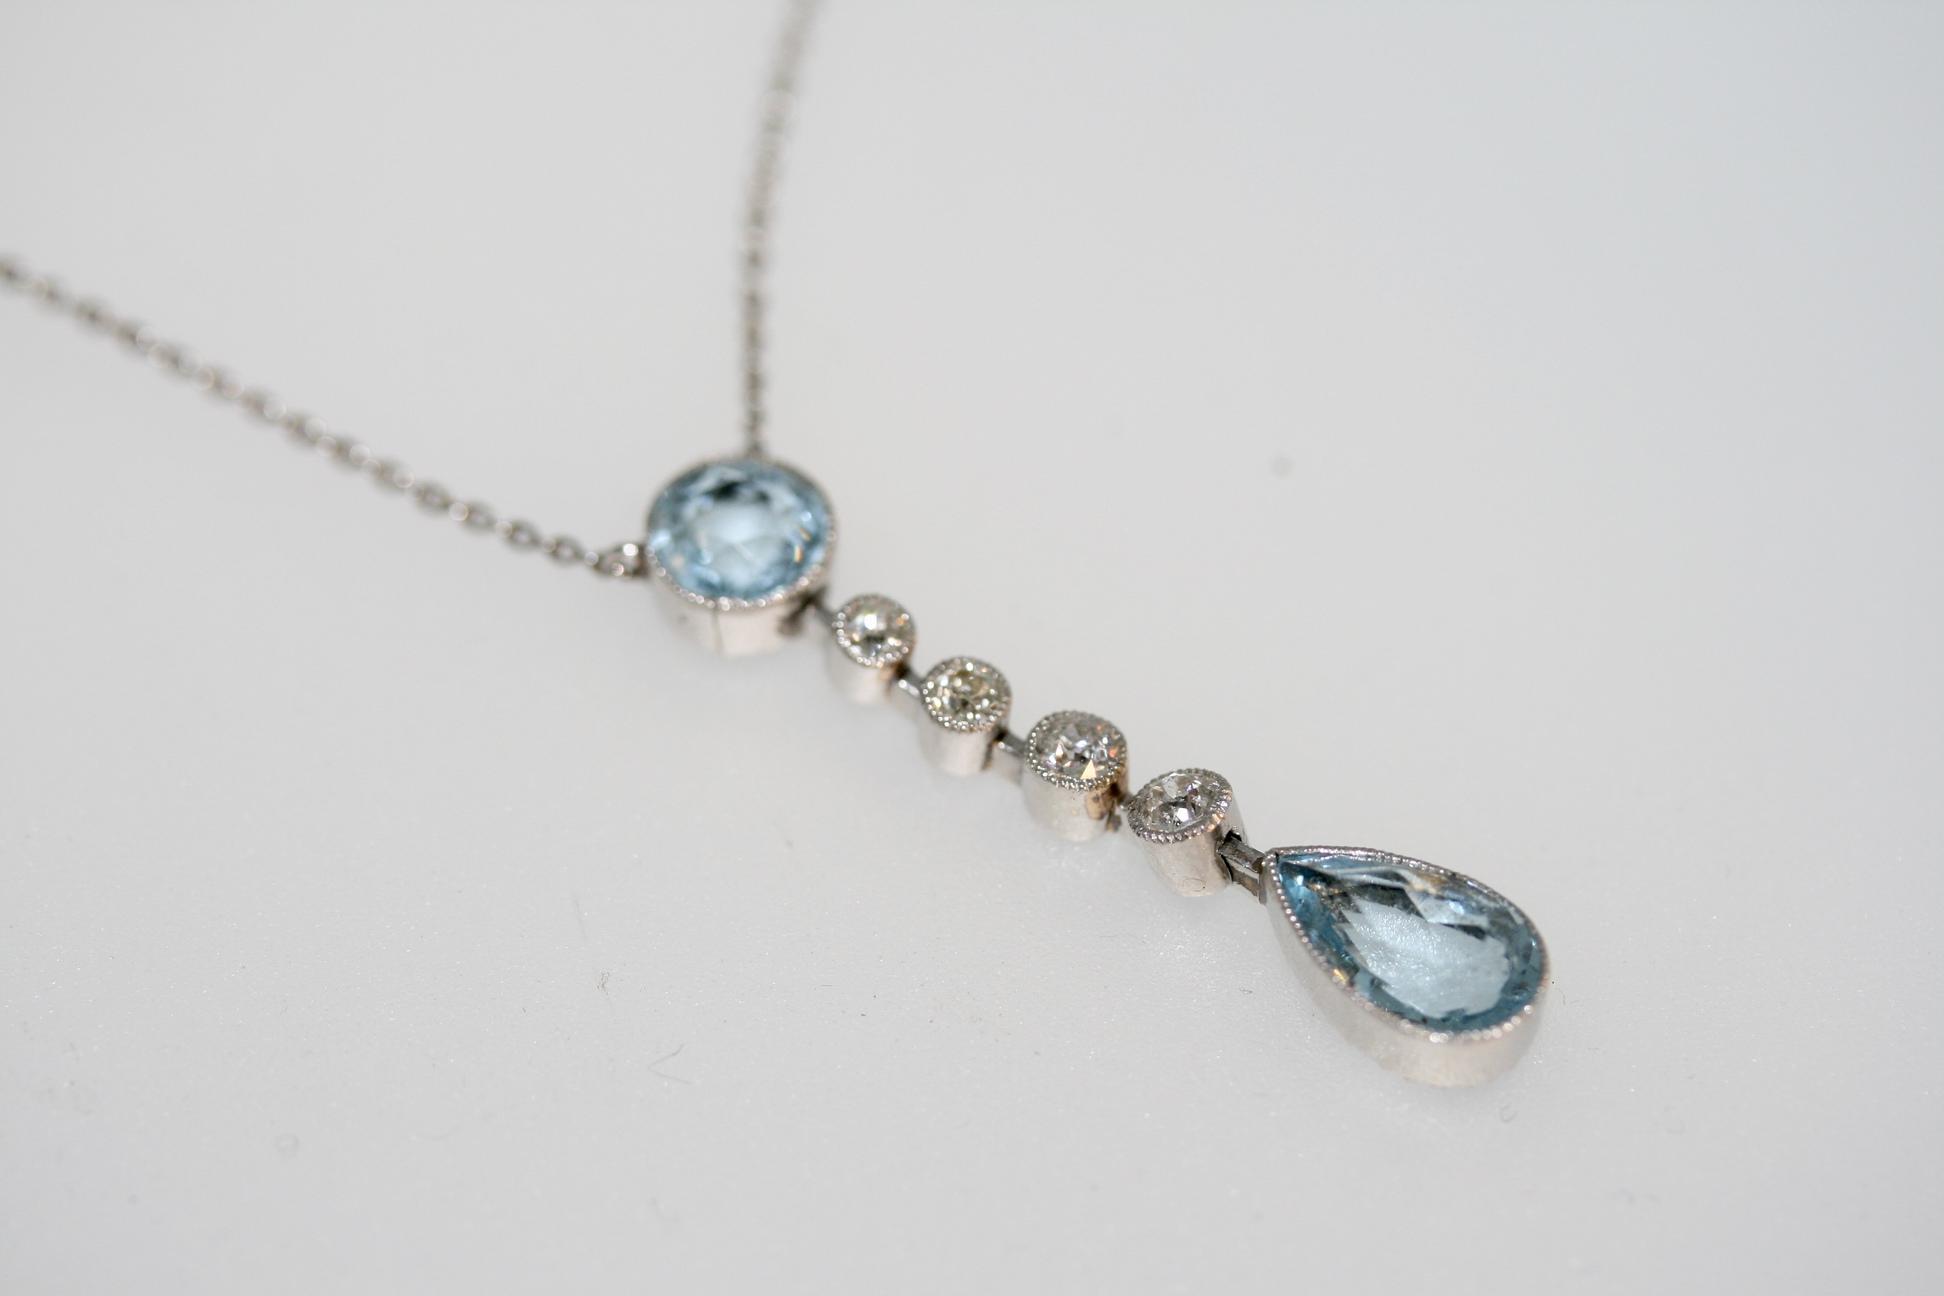 An Art Deco Aquamarine And Diamond Necklace, Circa 1930's